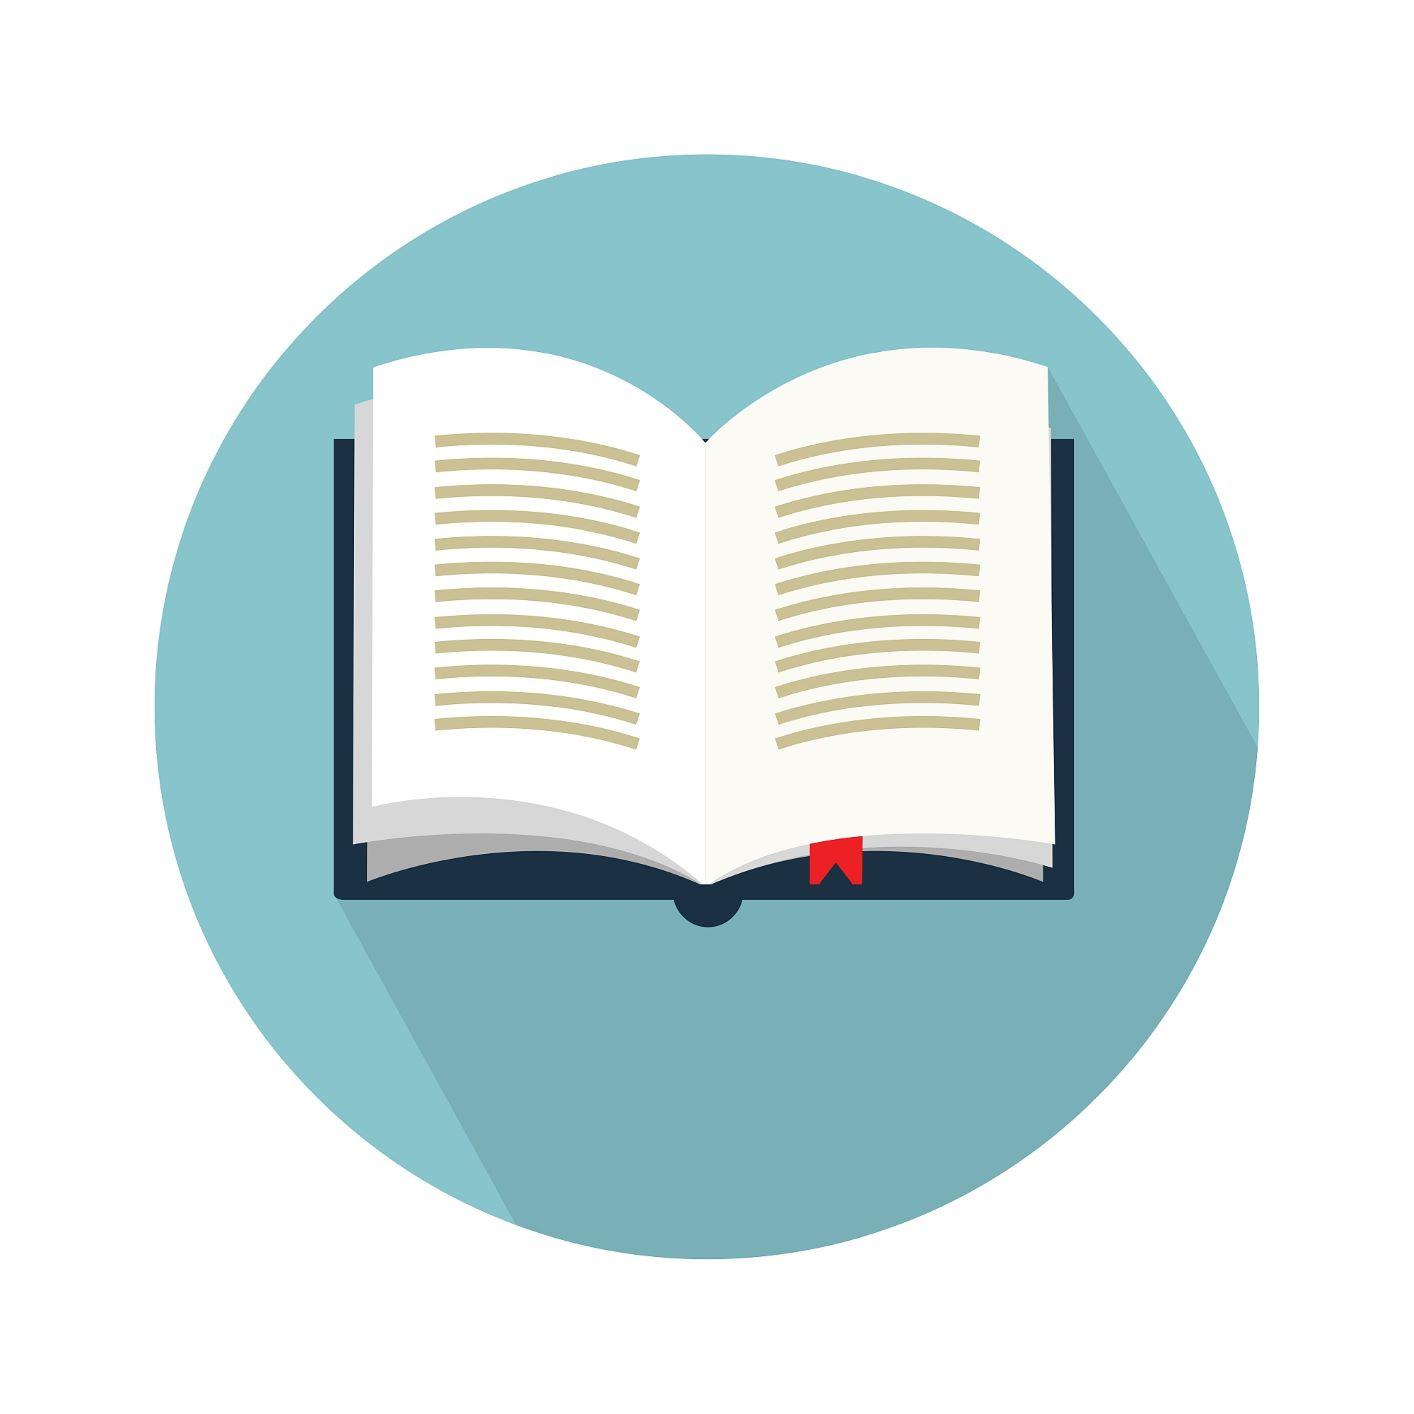 Teczka edukacyjna Edulatki - 2-latek